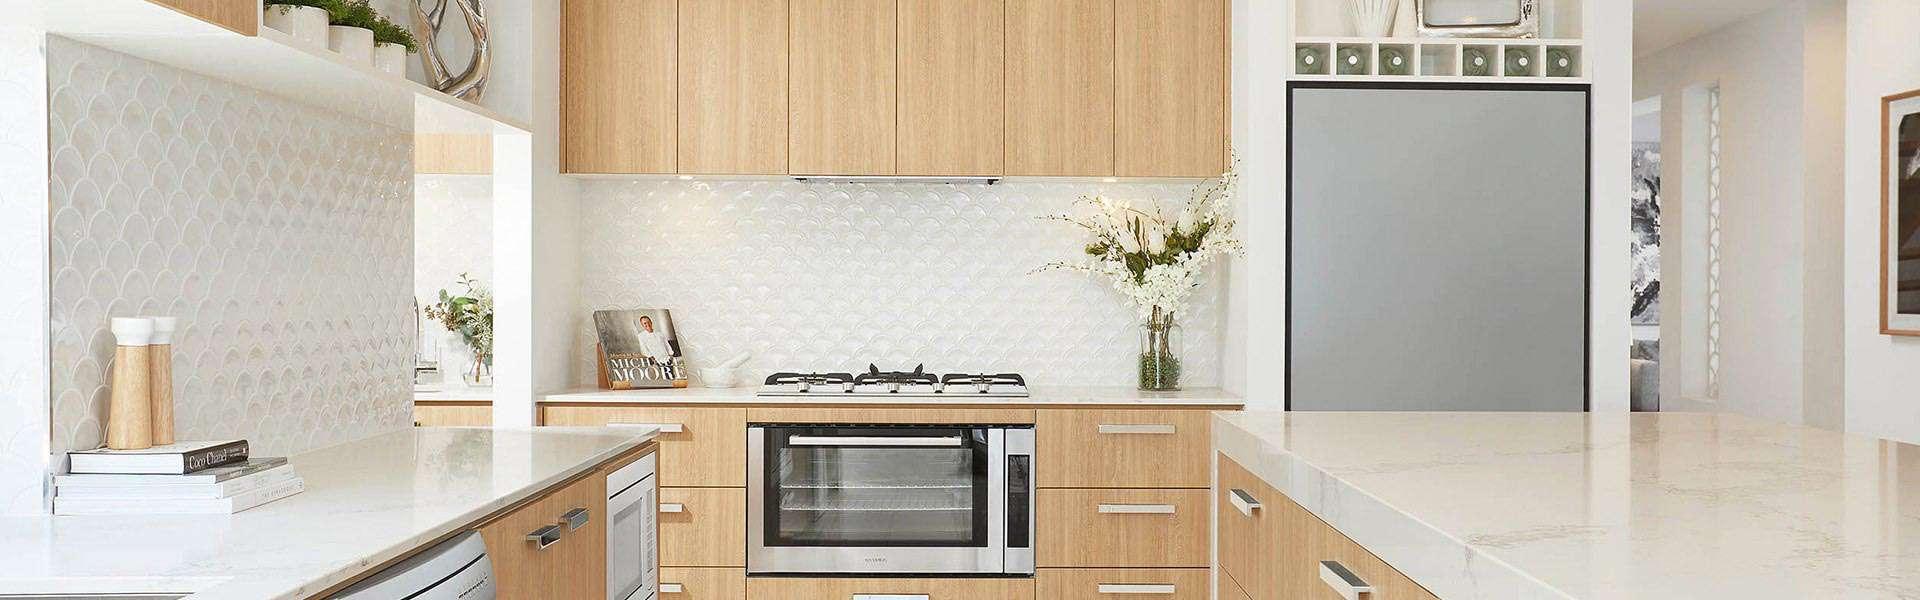 Beautiful spacious kitchen   Omni Built Homes